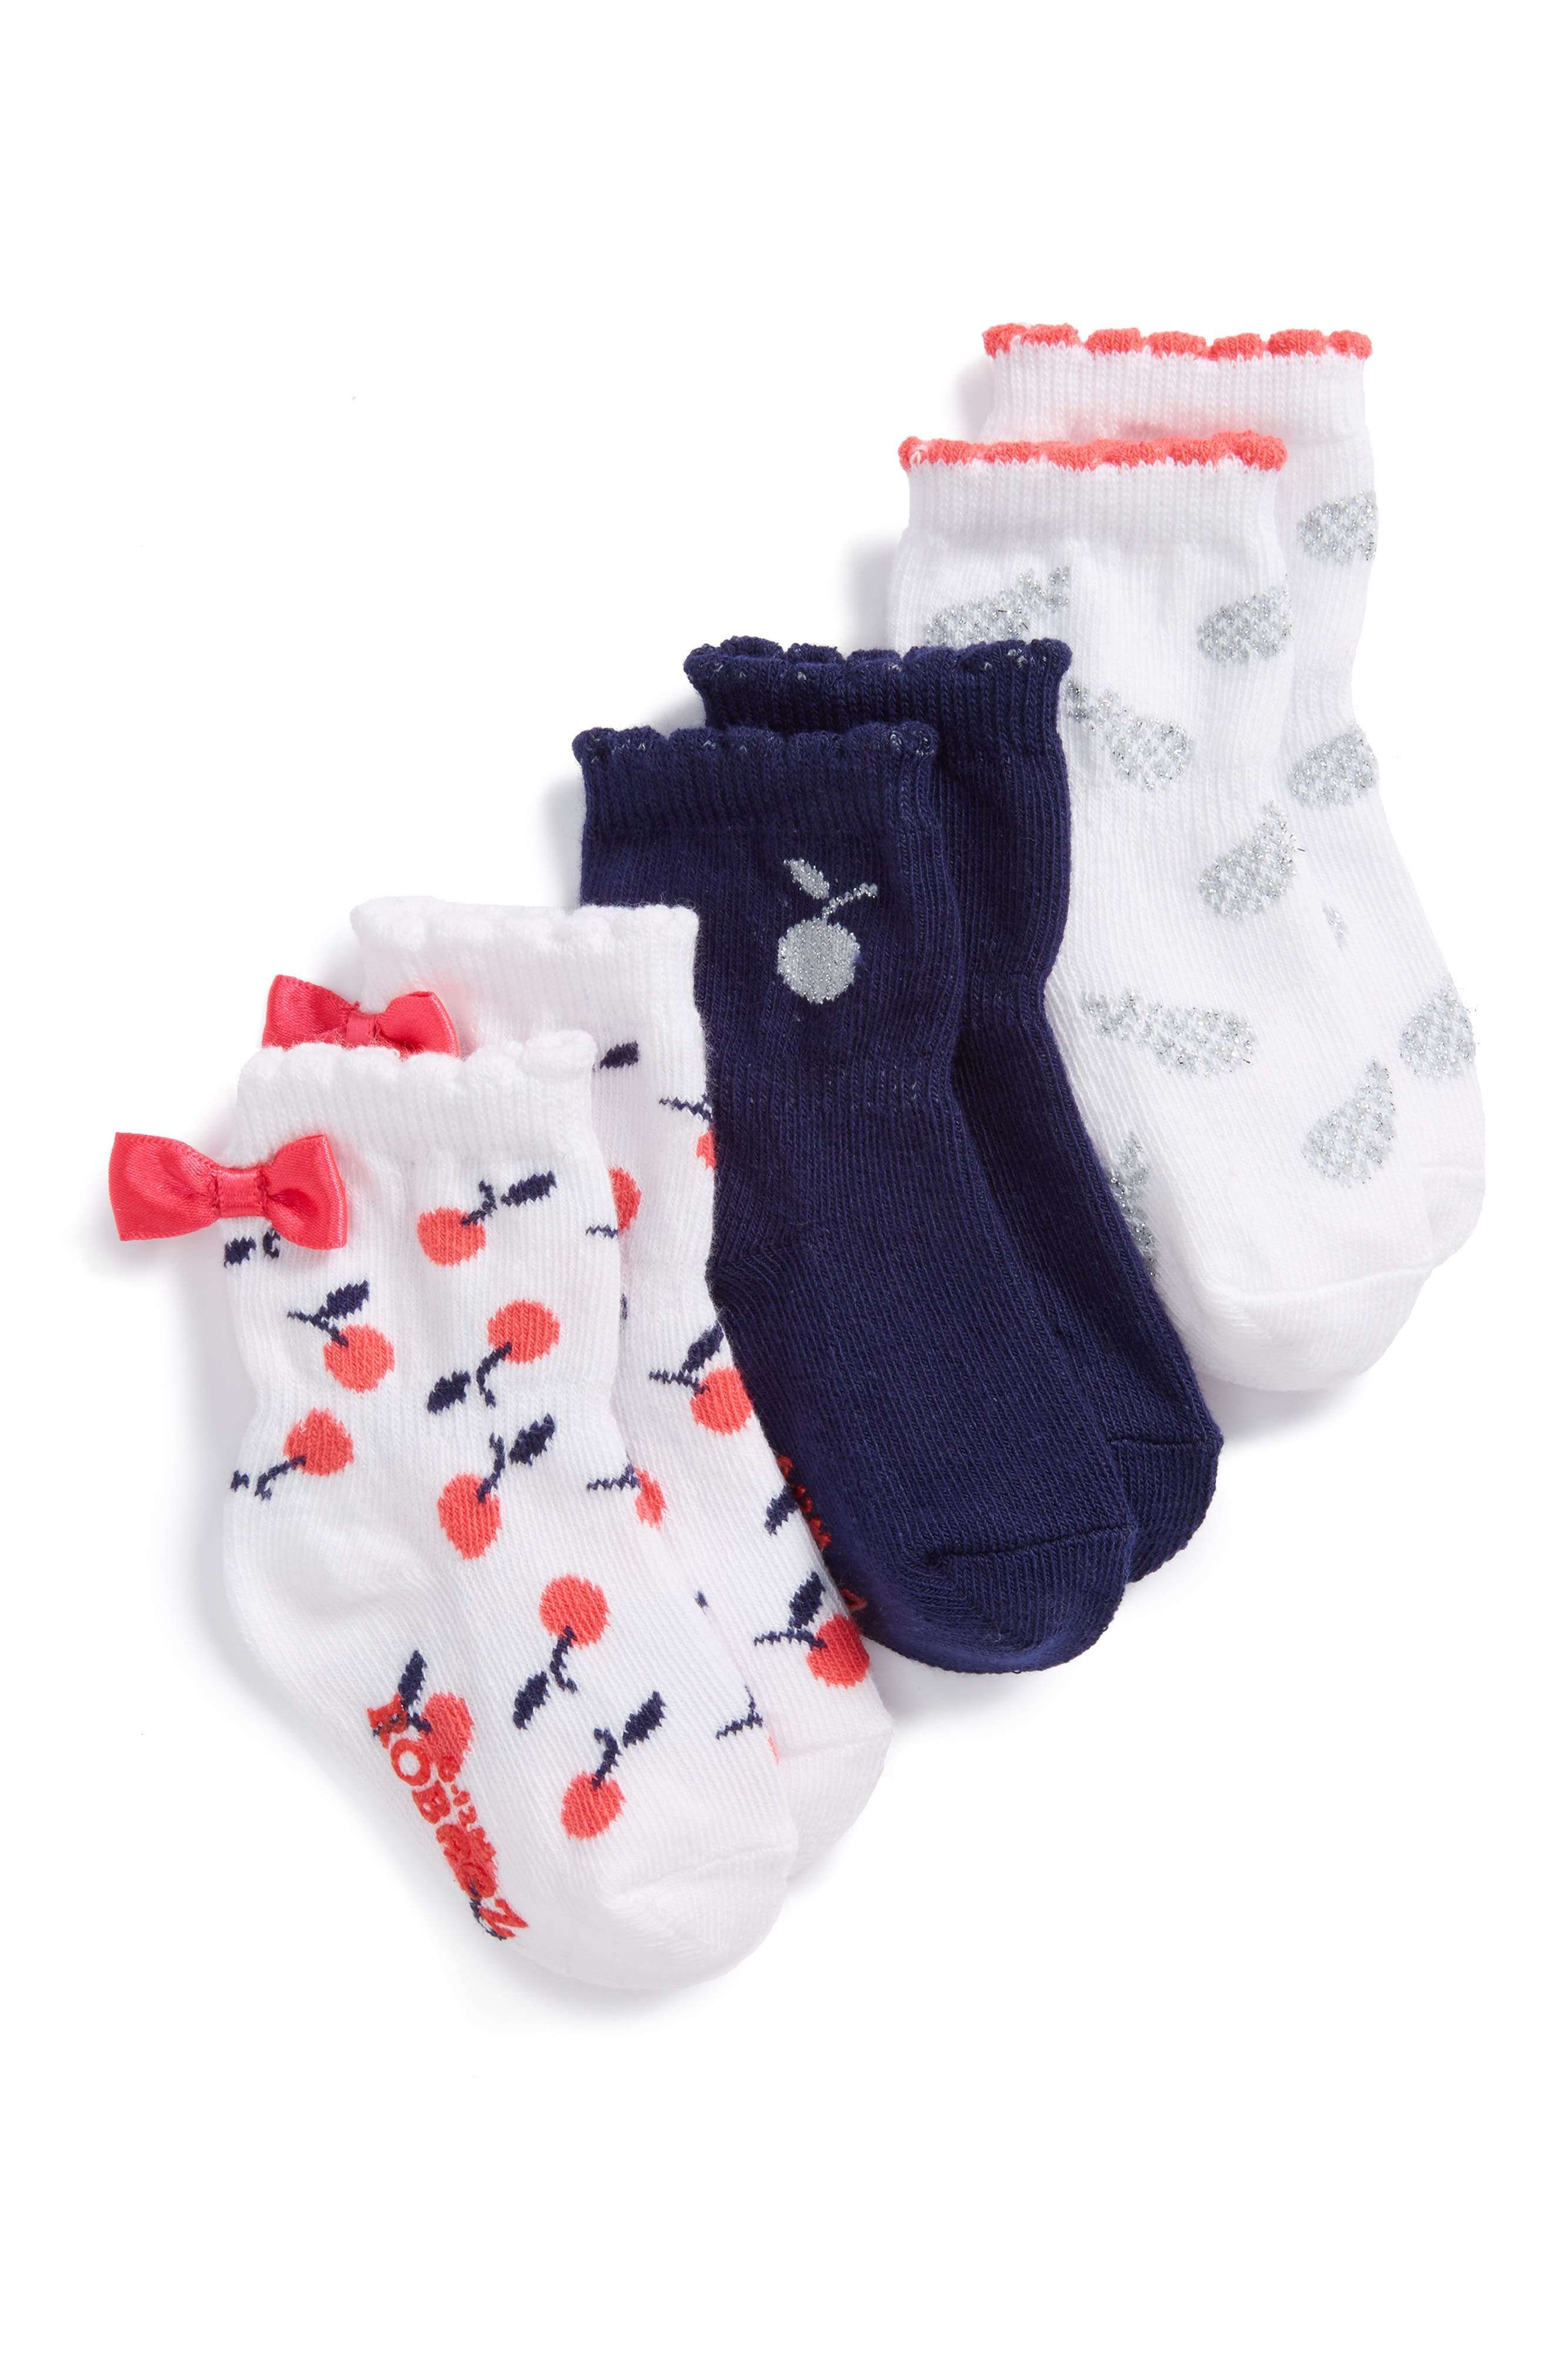 Alternate Image 1 Selected - Robeez® Assorted 3-Pack Socks (Baby)